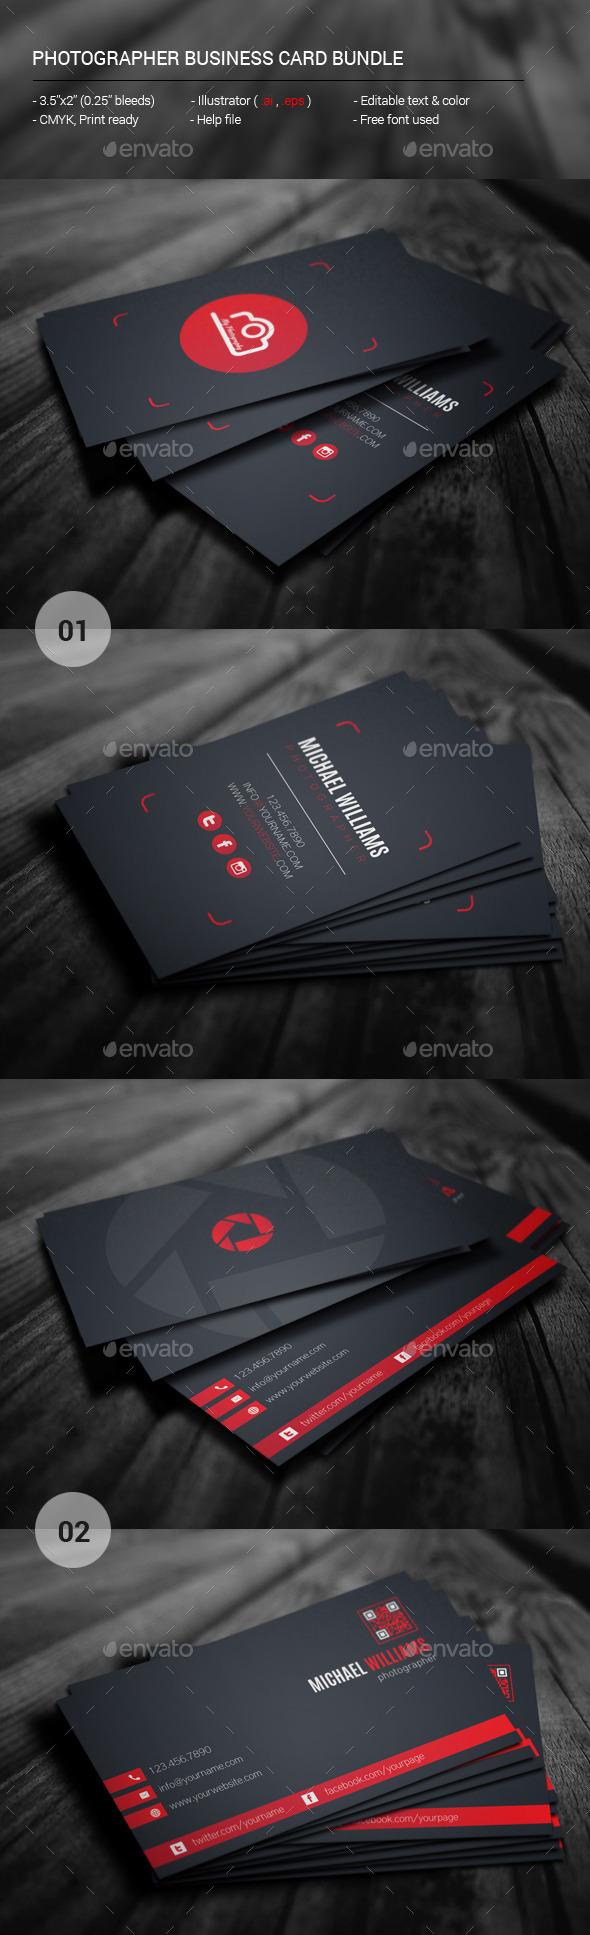 GraphicRiver Photographer Business Card Bundle 11395880